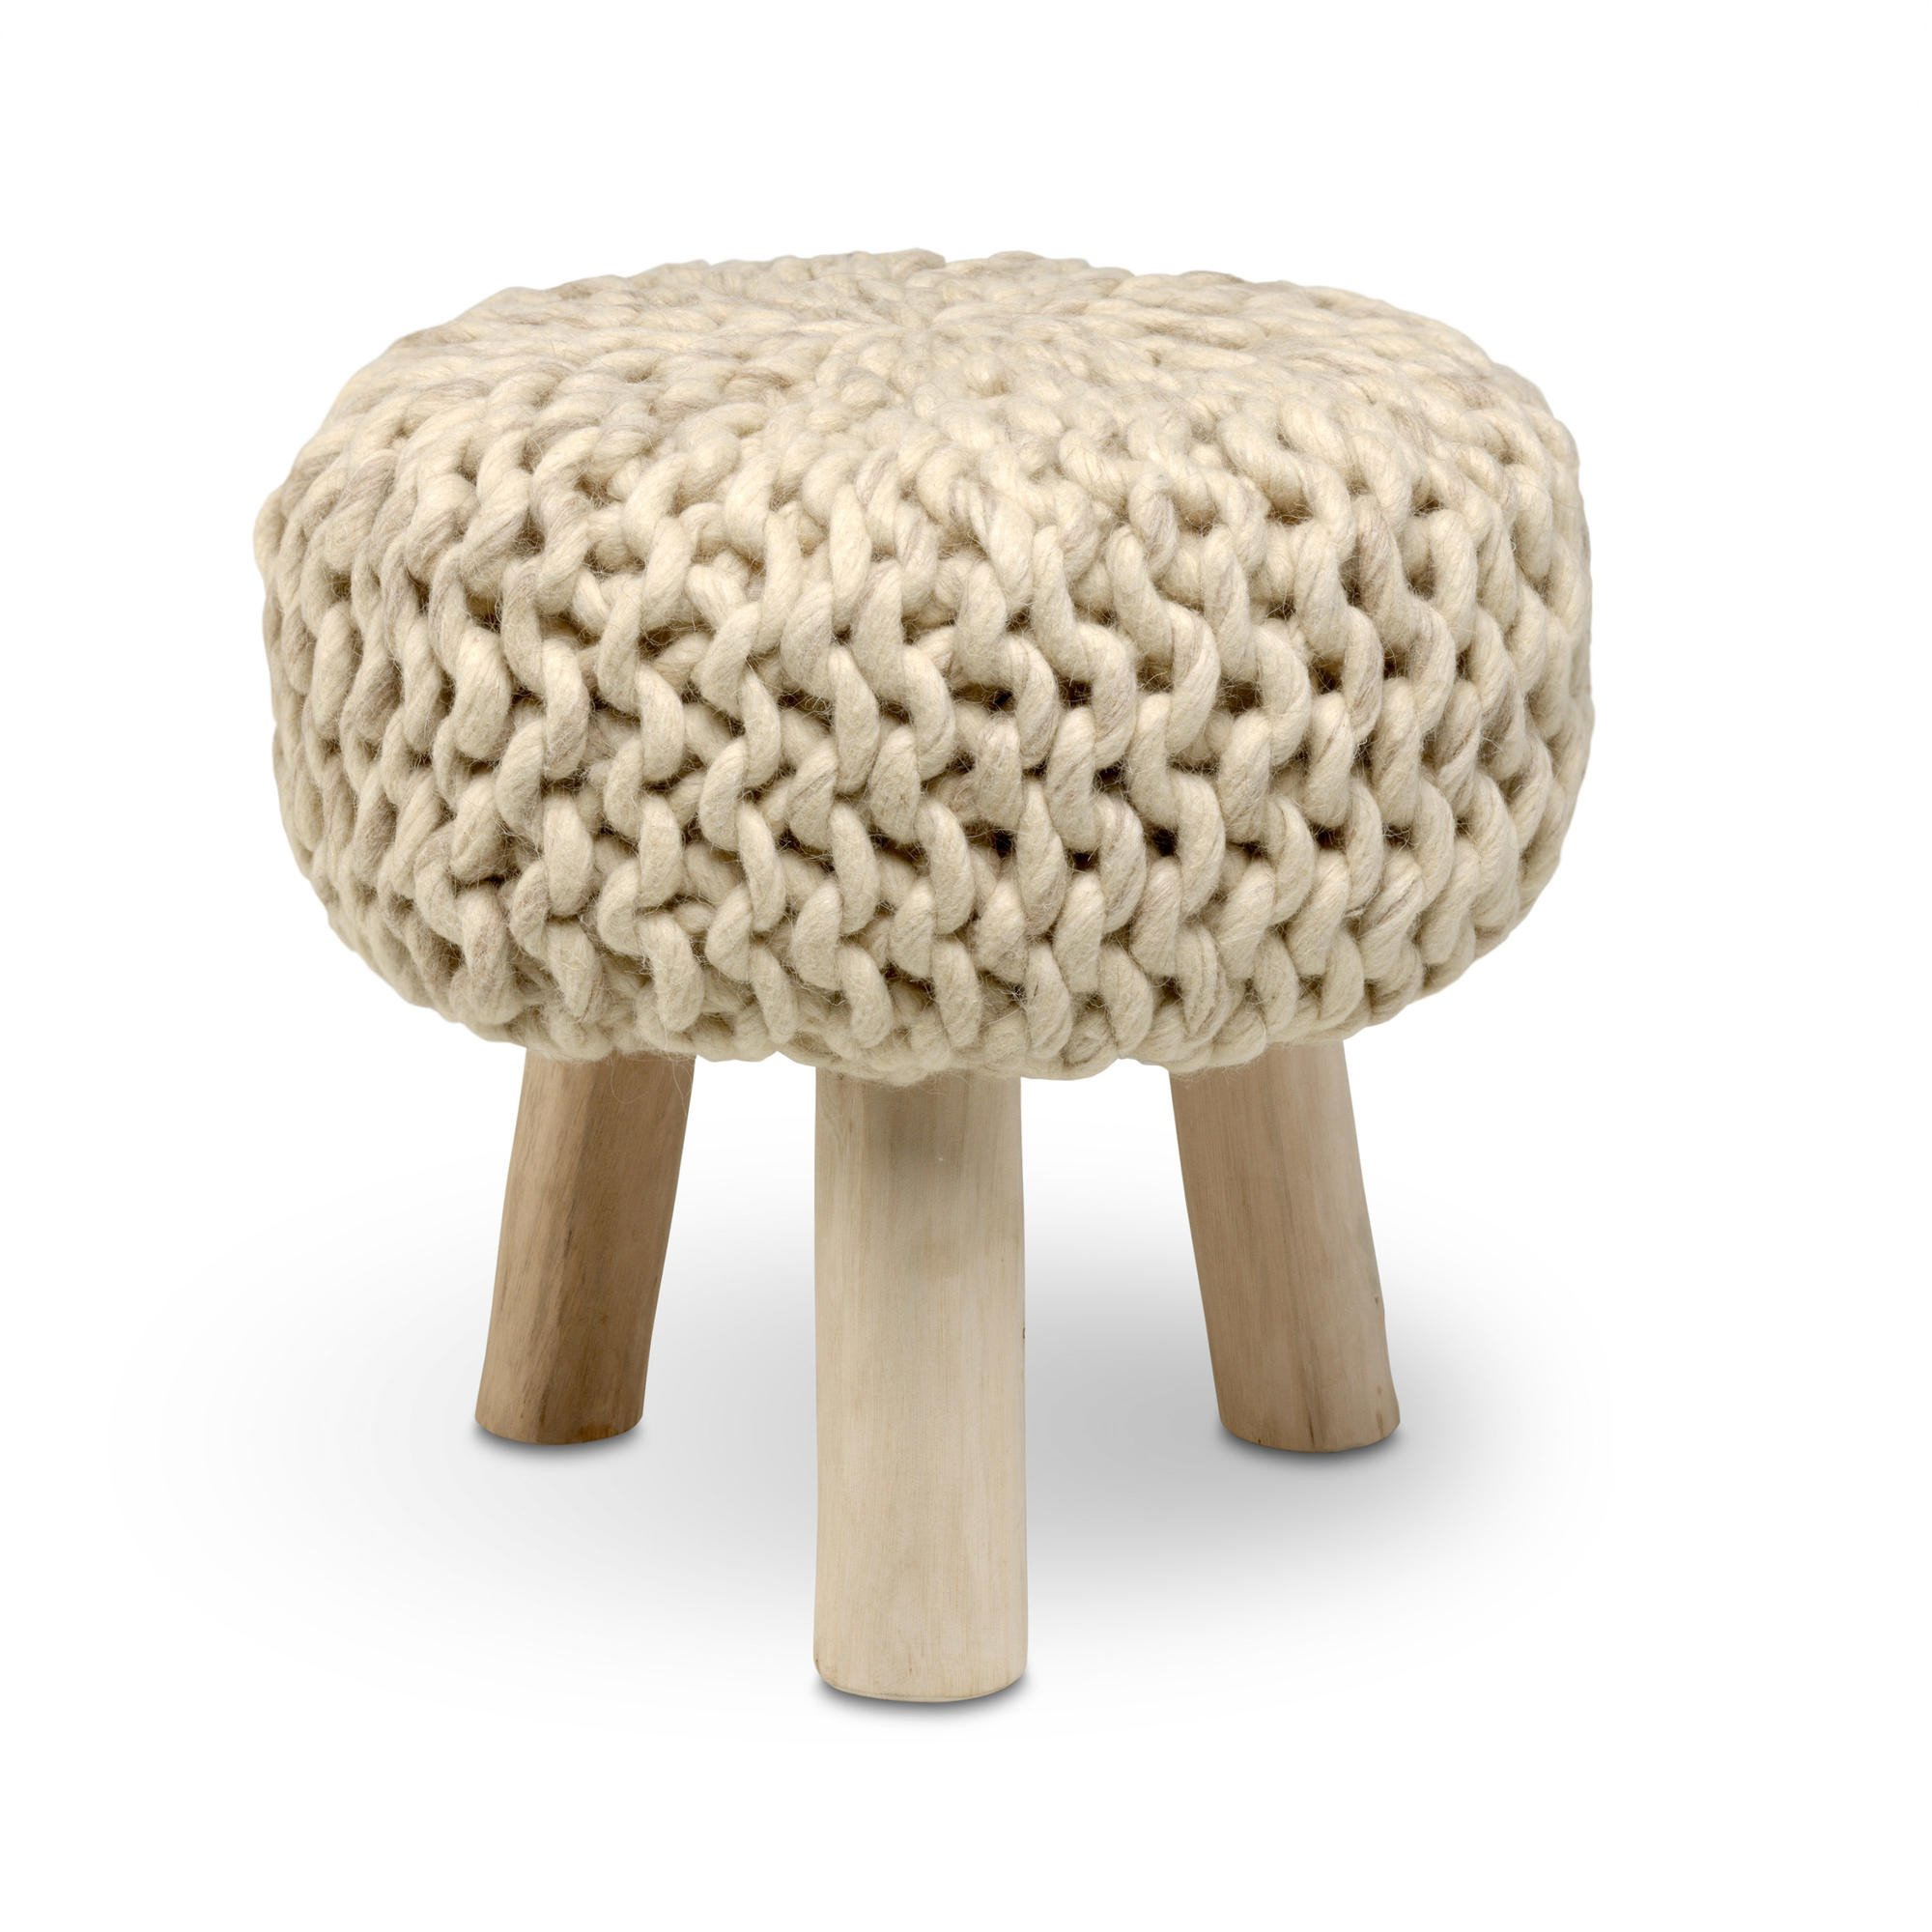 Wool Stool   Beige